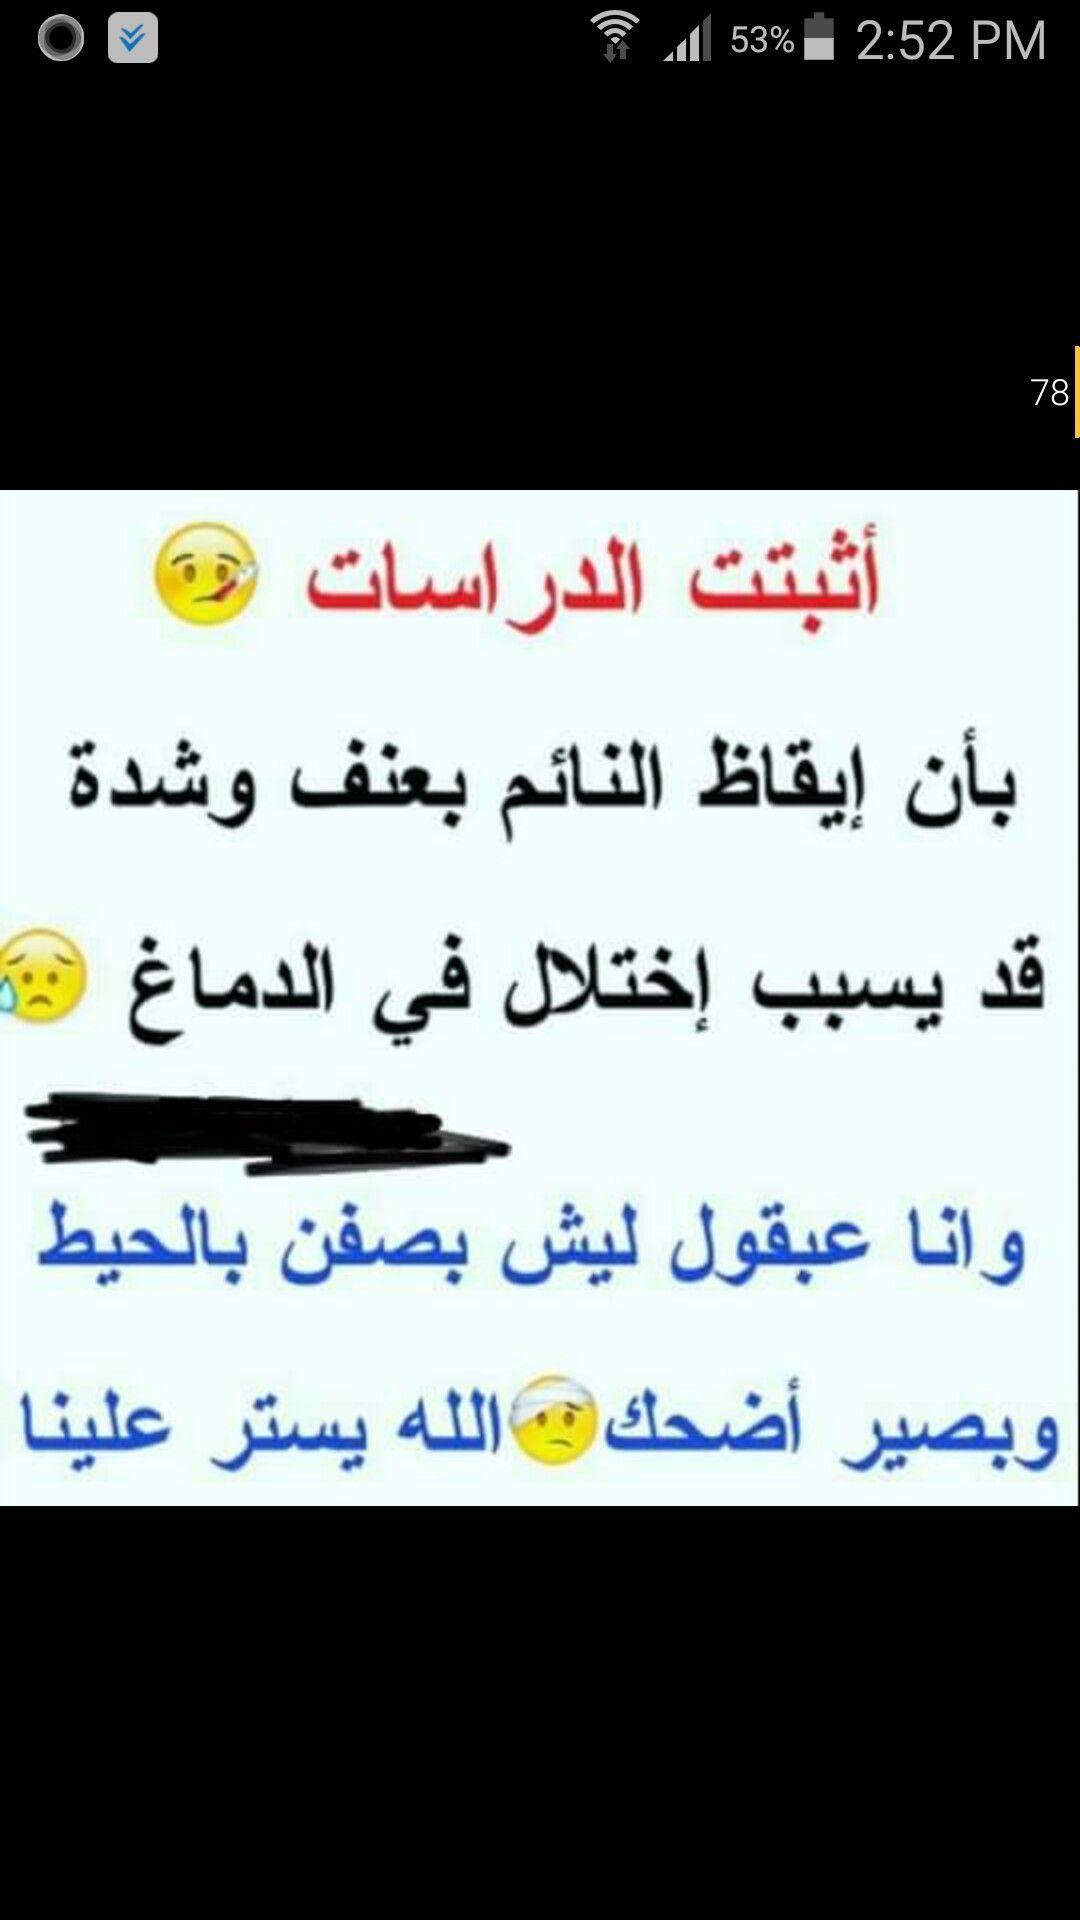 Nourxd Plz Like Https M Facebook Com Fimnkarnabit في منك ع قرنبيط Funny Arabic Quotes Funny Quotes Jokes